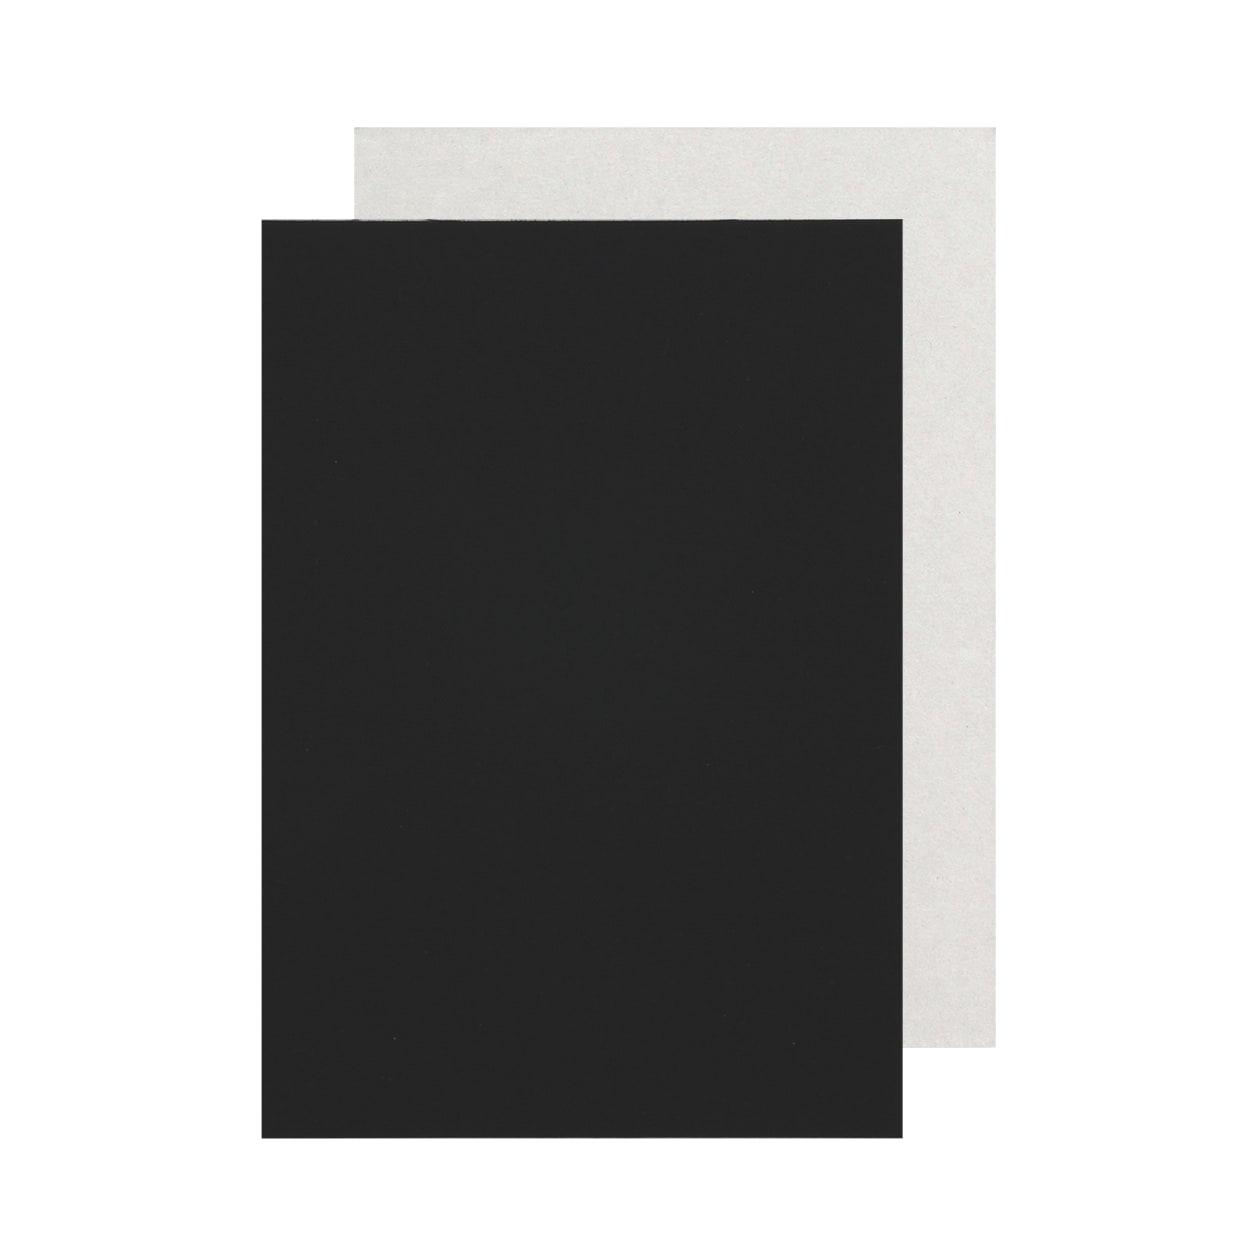 Pカード 細布 ブラック×グレー